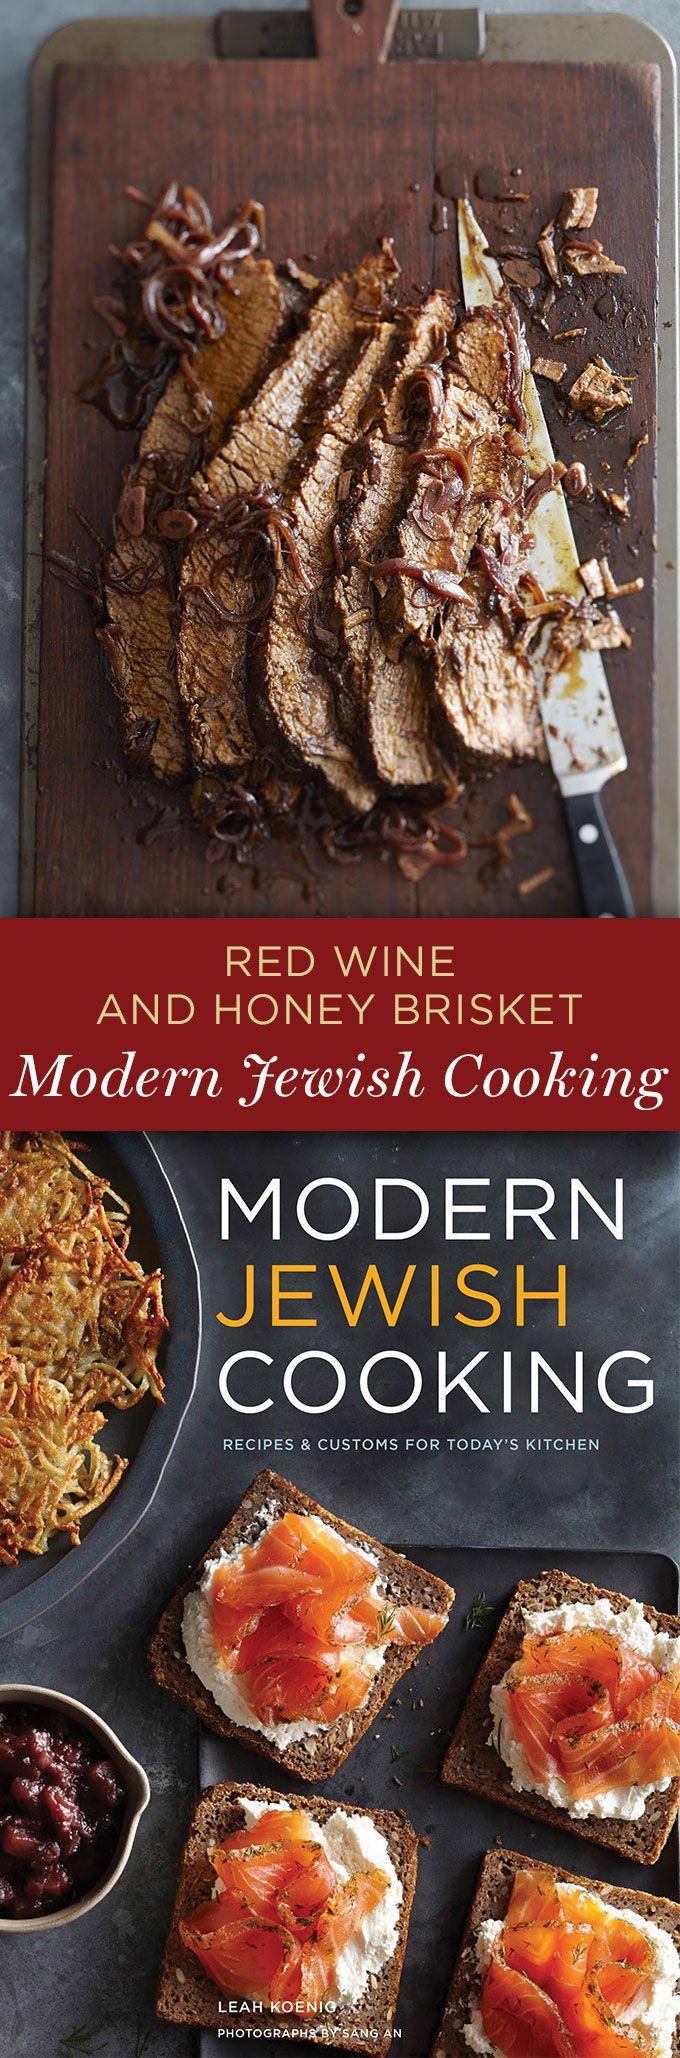 Modern Jewish Cooking  Cookbooks We So Want  Hanukkah